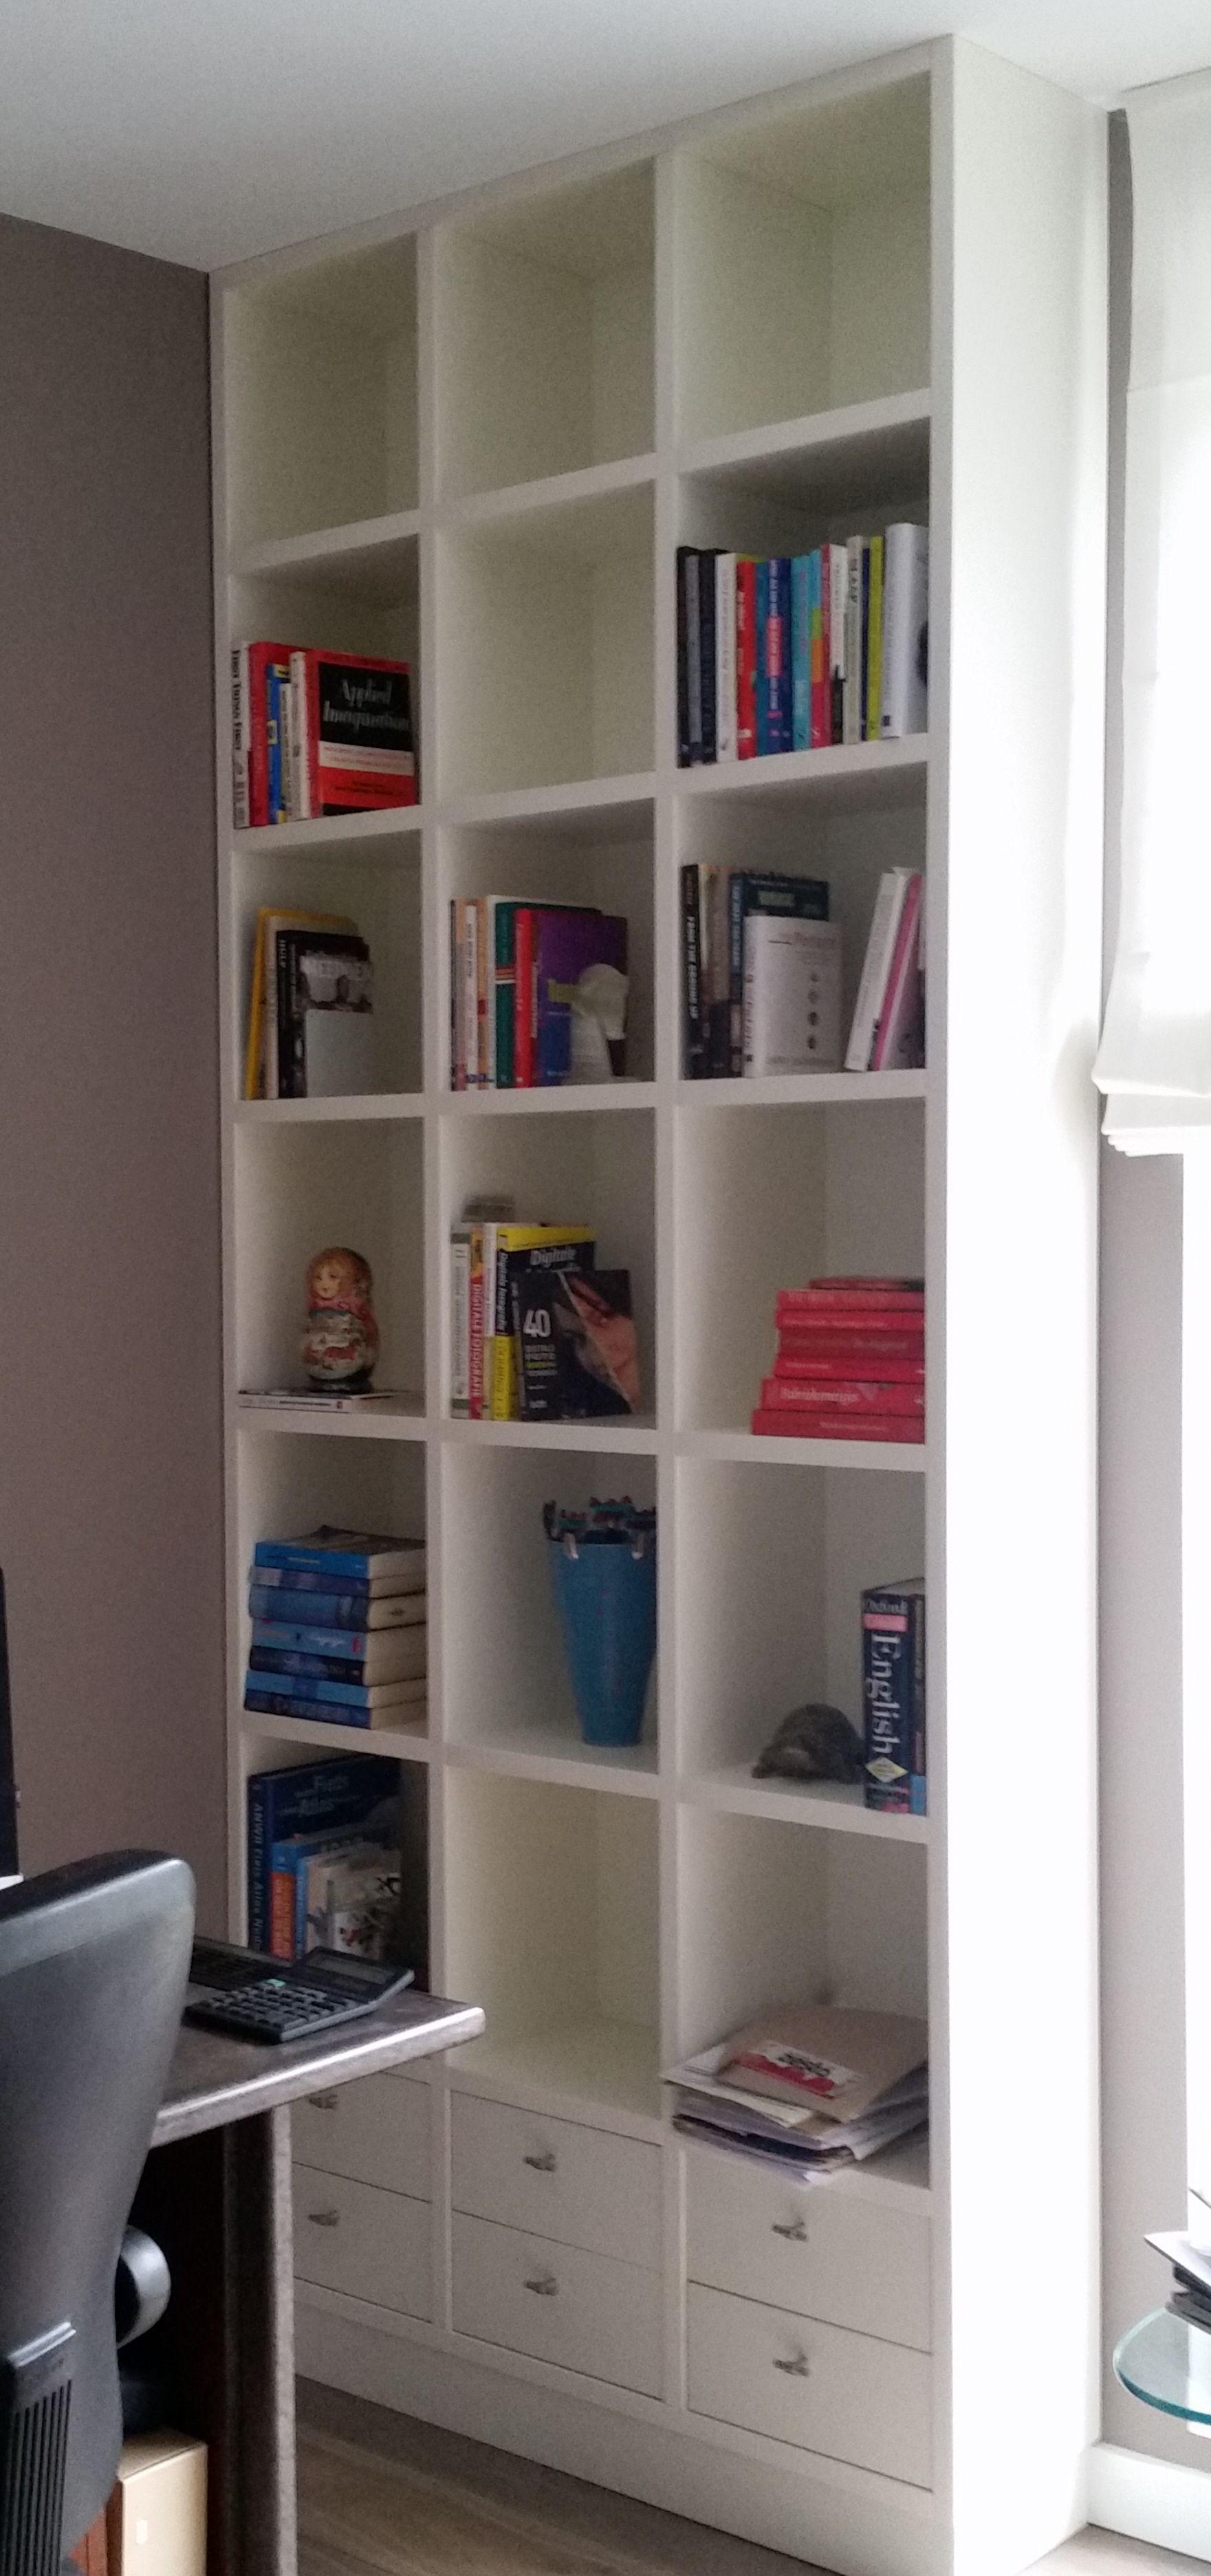 Boekenkast strak tussen vloer en plafond. Dik materiaal, beplakt met ...